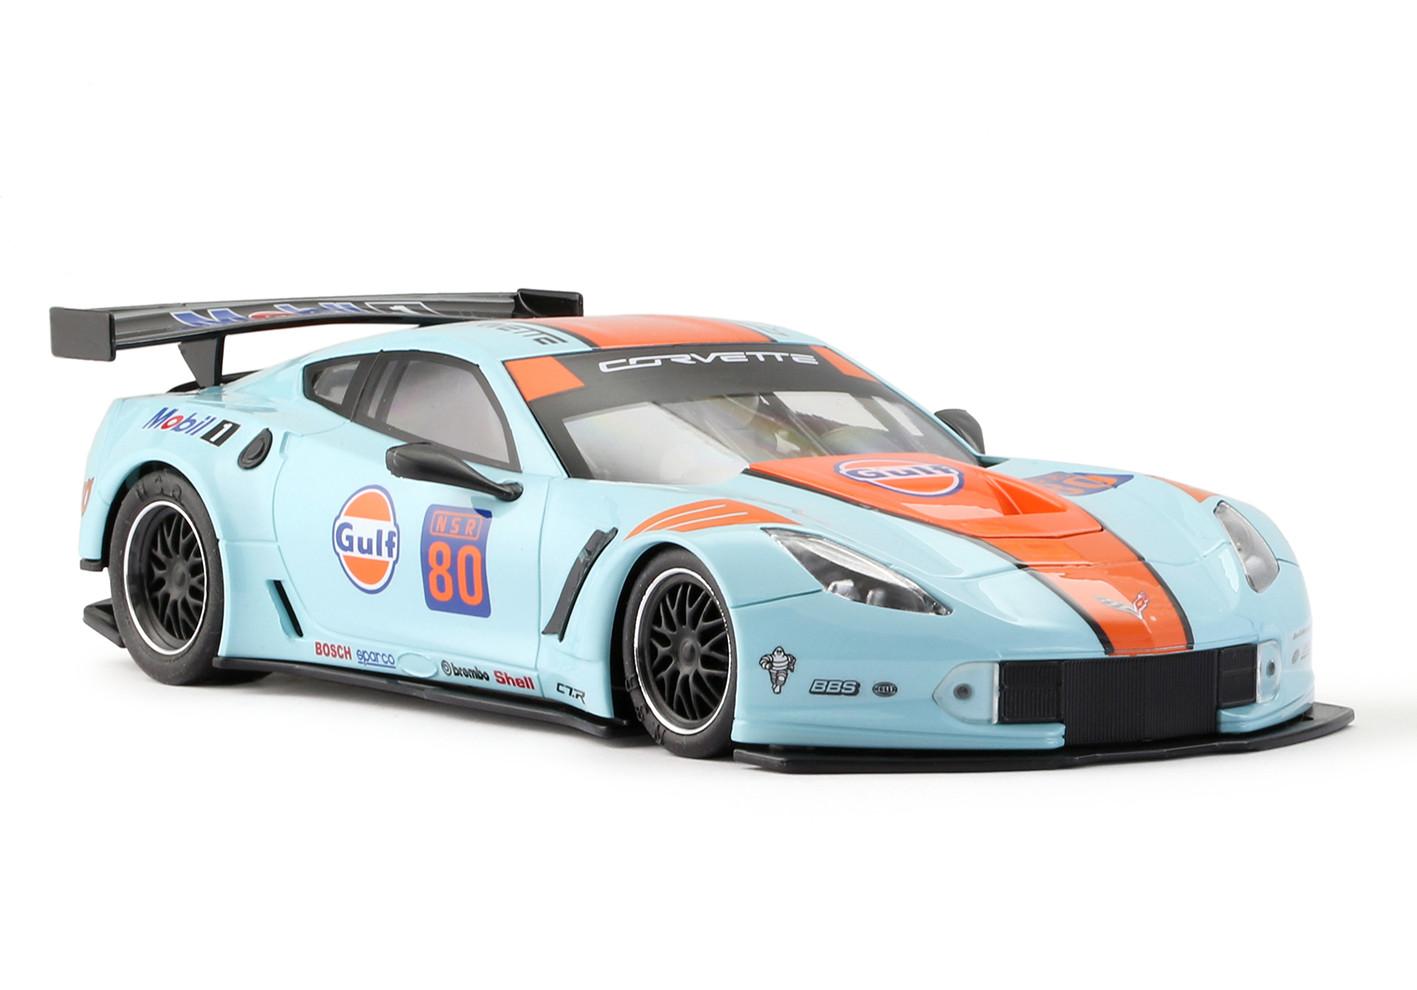 NSR - Corvette C7R #80, Gulf Edition: 0068AW